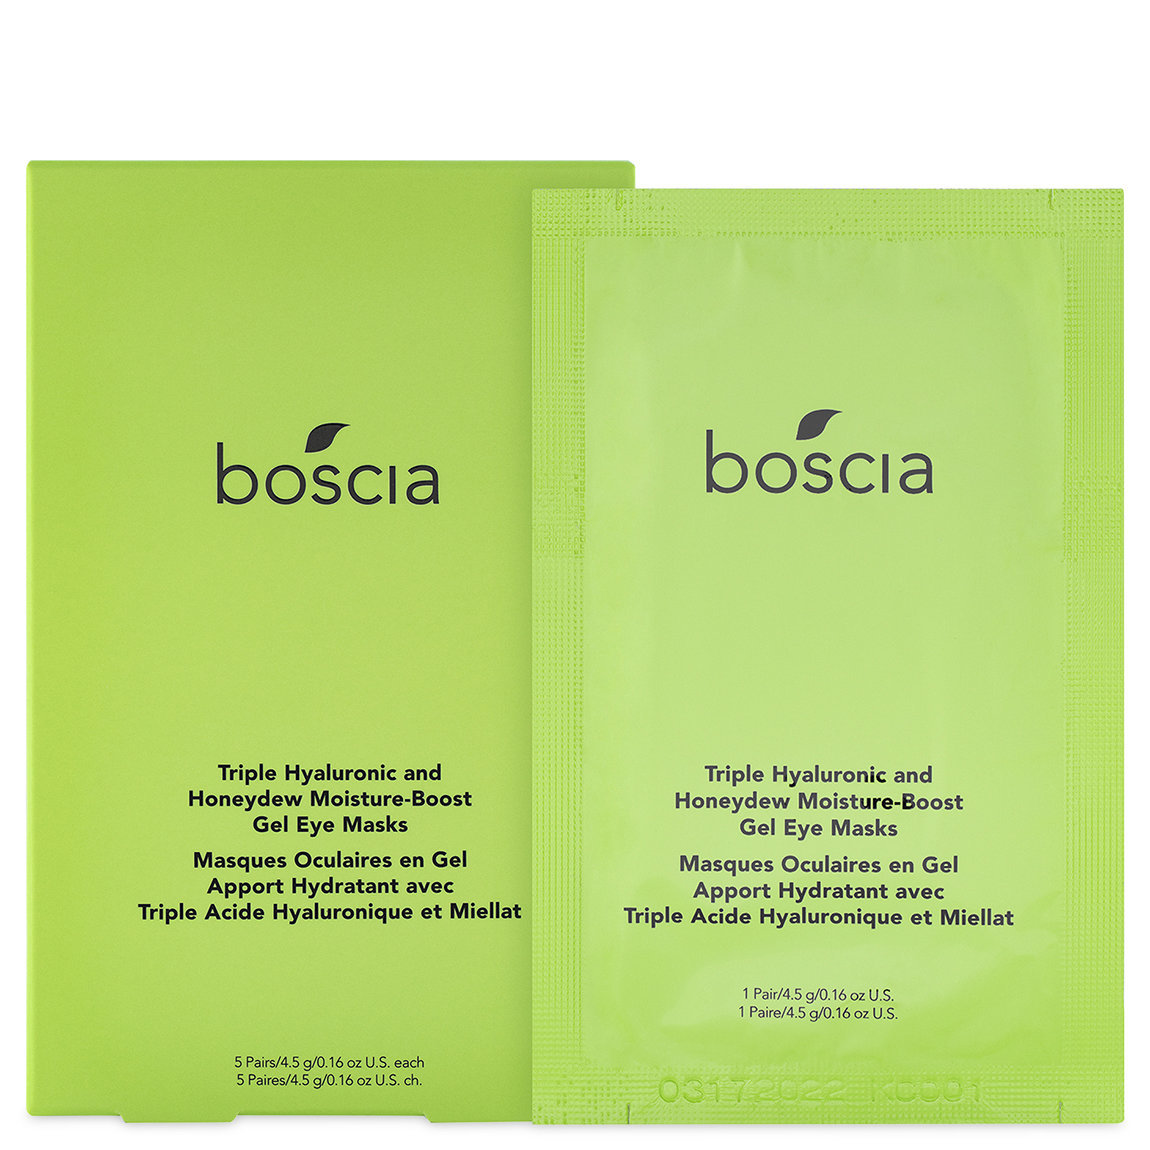 boscia Triple Hyaluronic & Honeydew Moisture-Boost Gel Eye Masks alternative view 1 - product swatch.